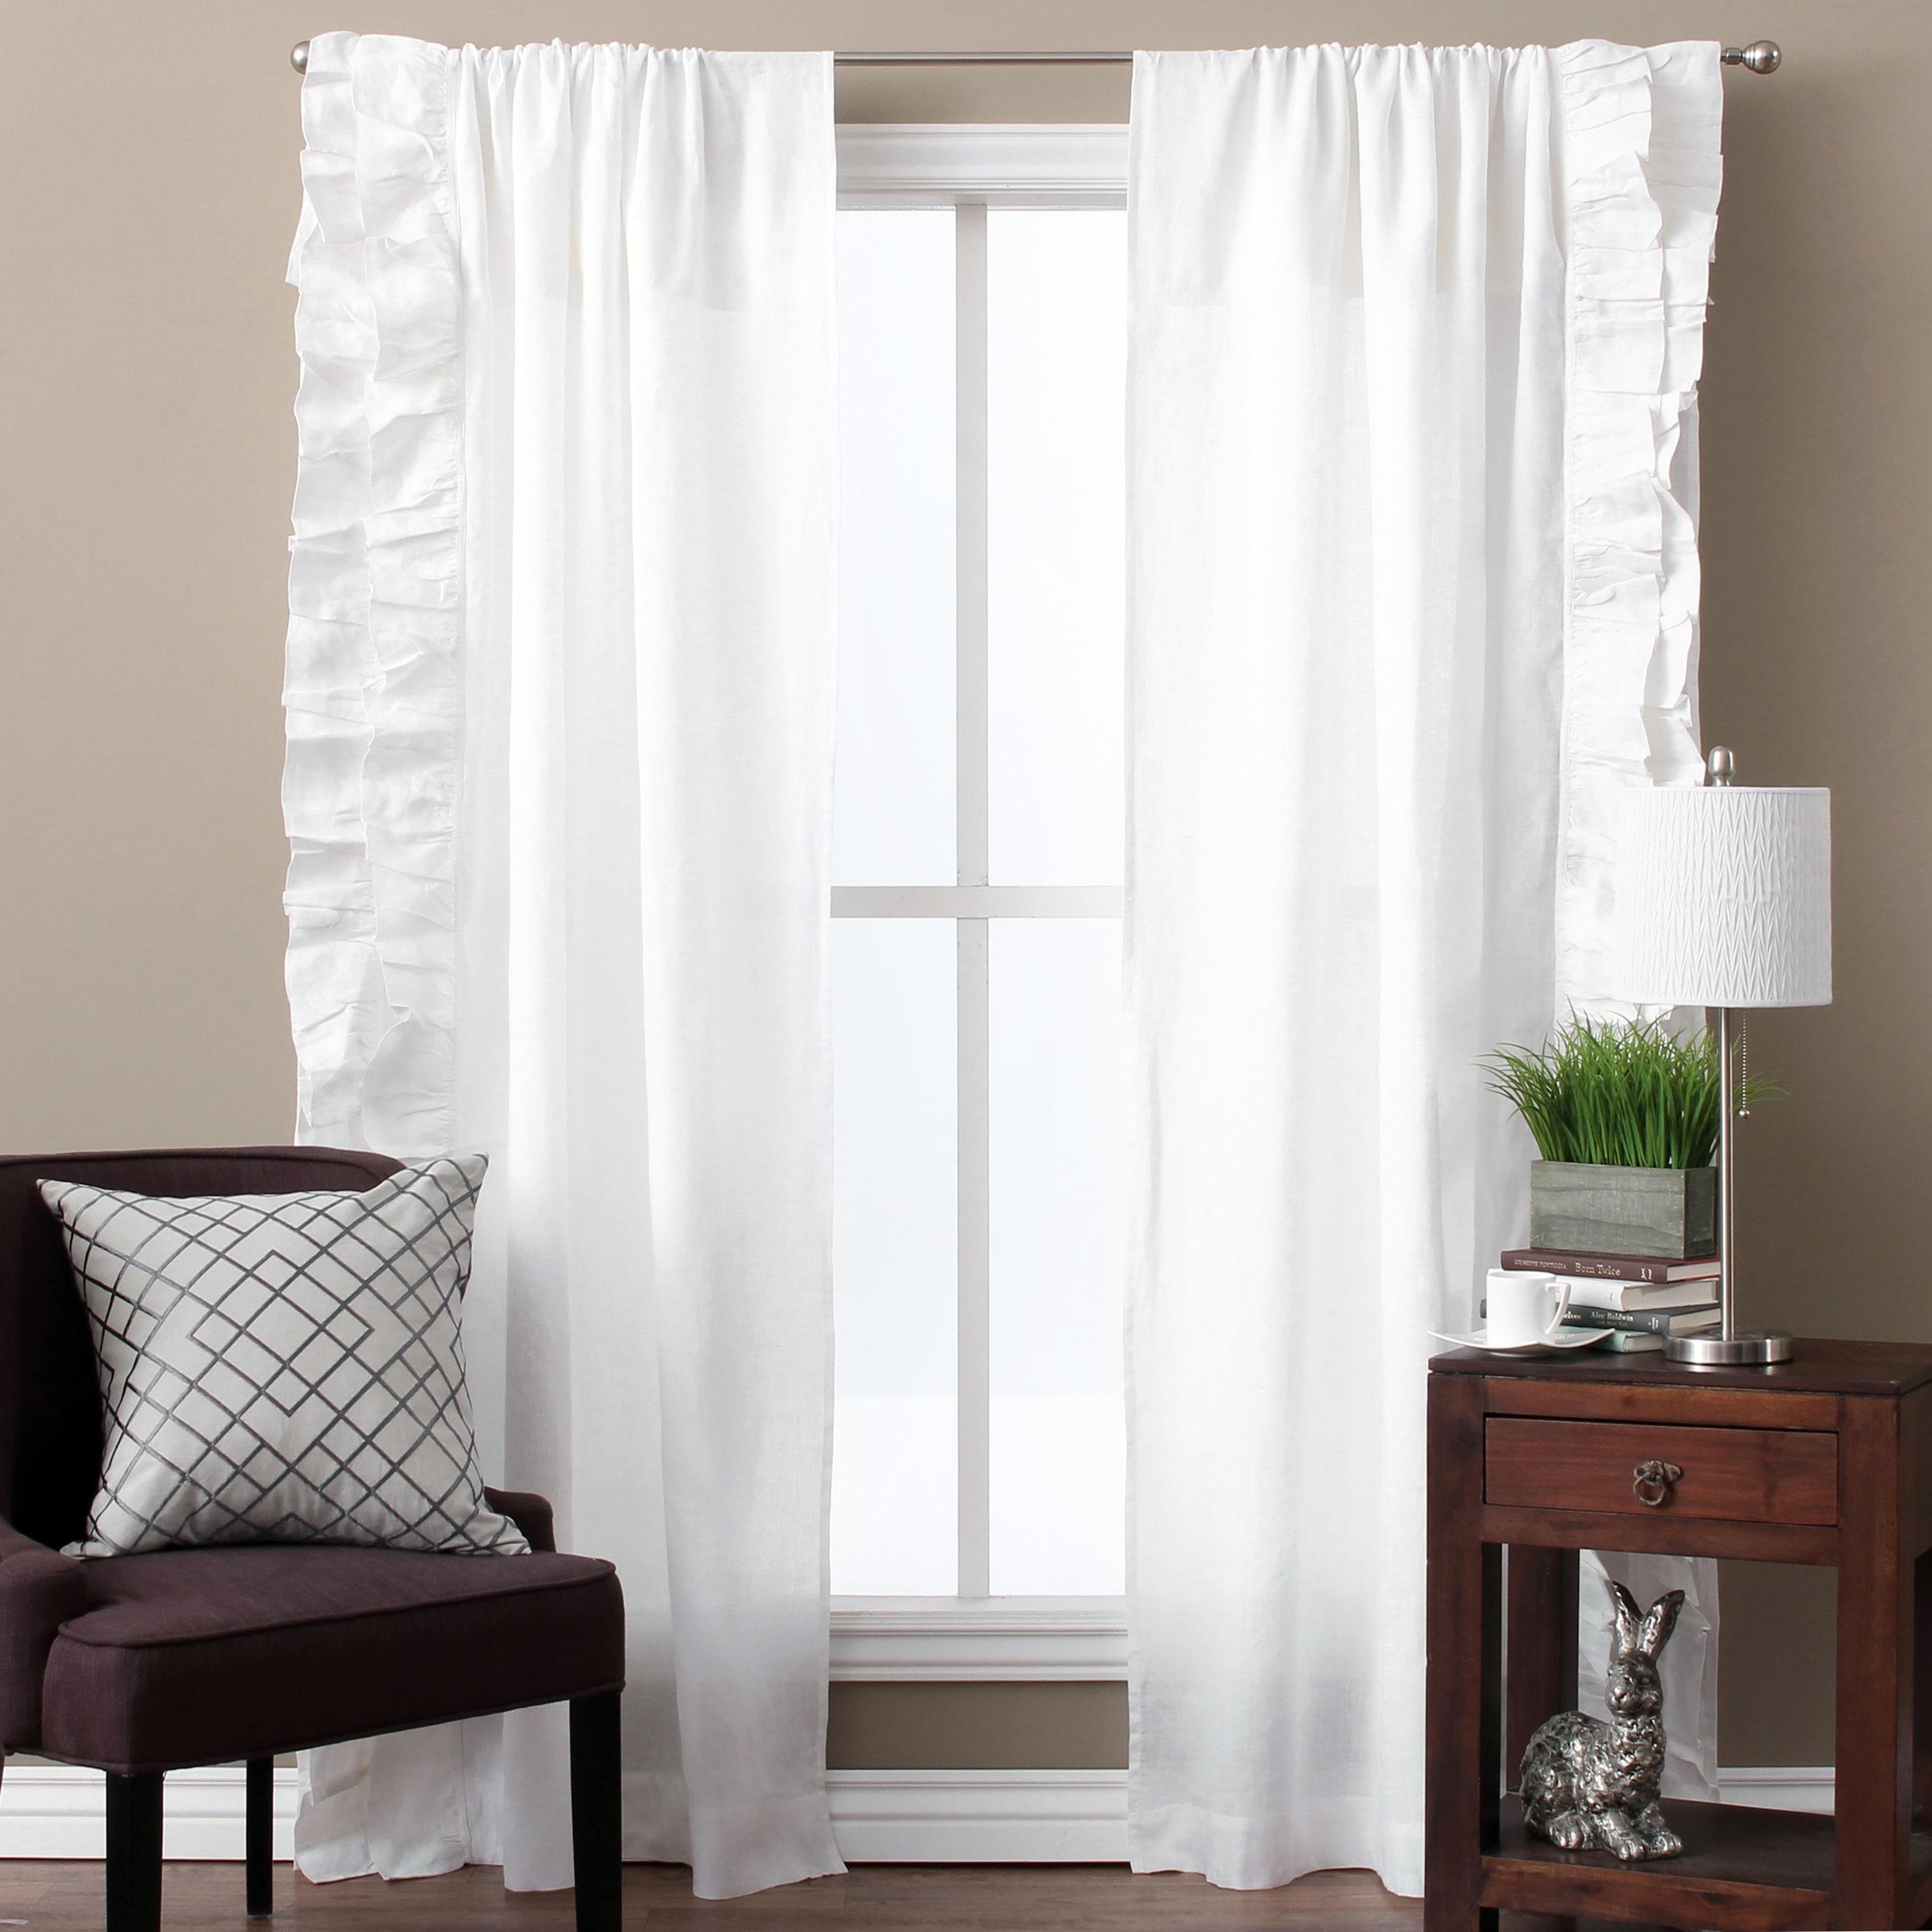 lushdecor panel wp ruffle lush gray com curtain decor curtains products avon window